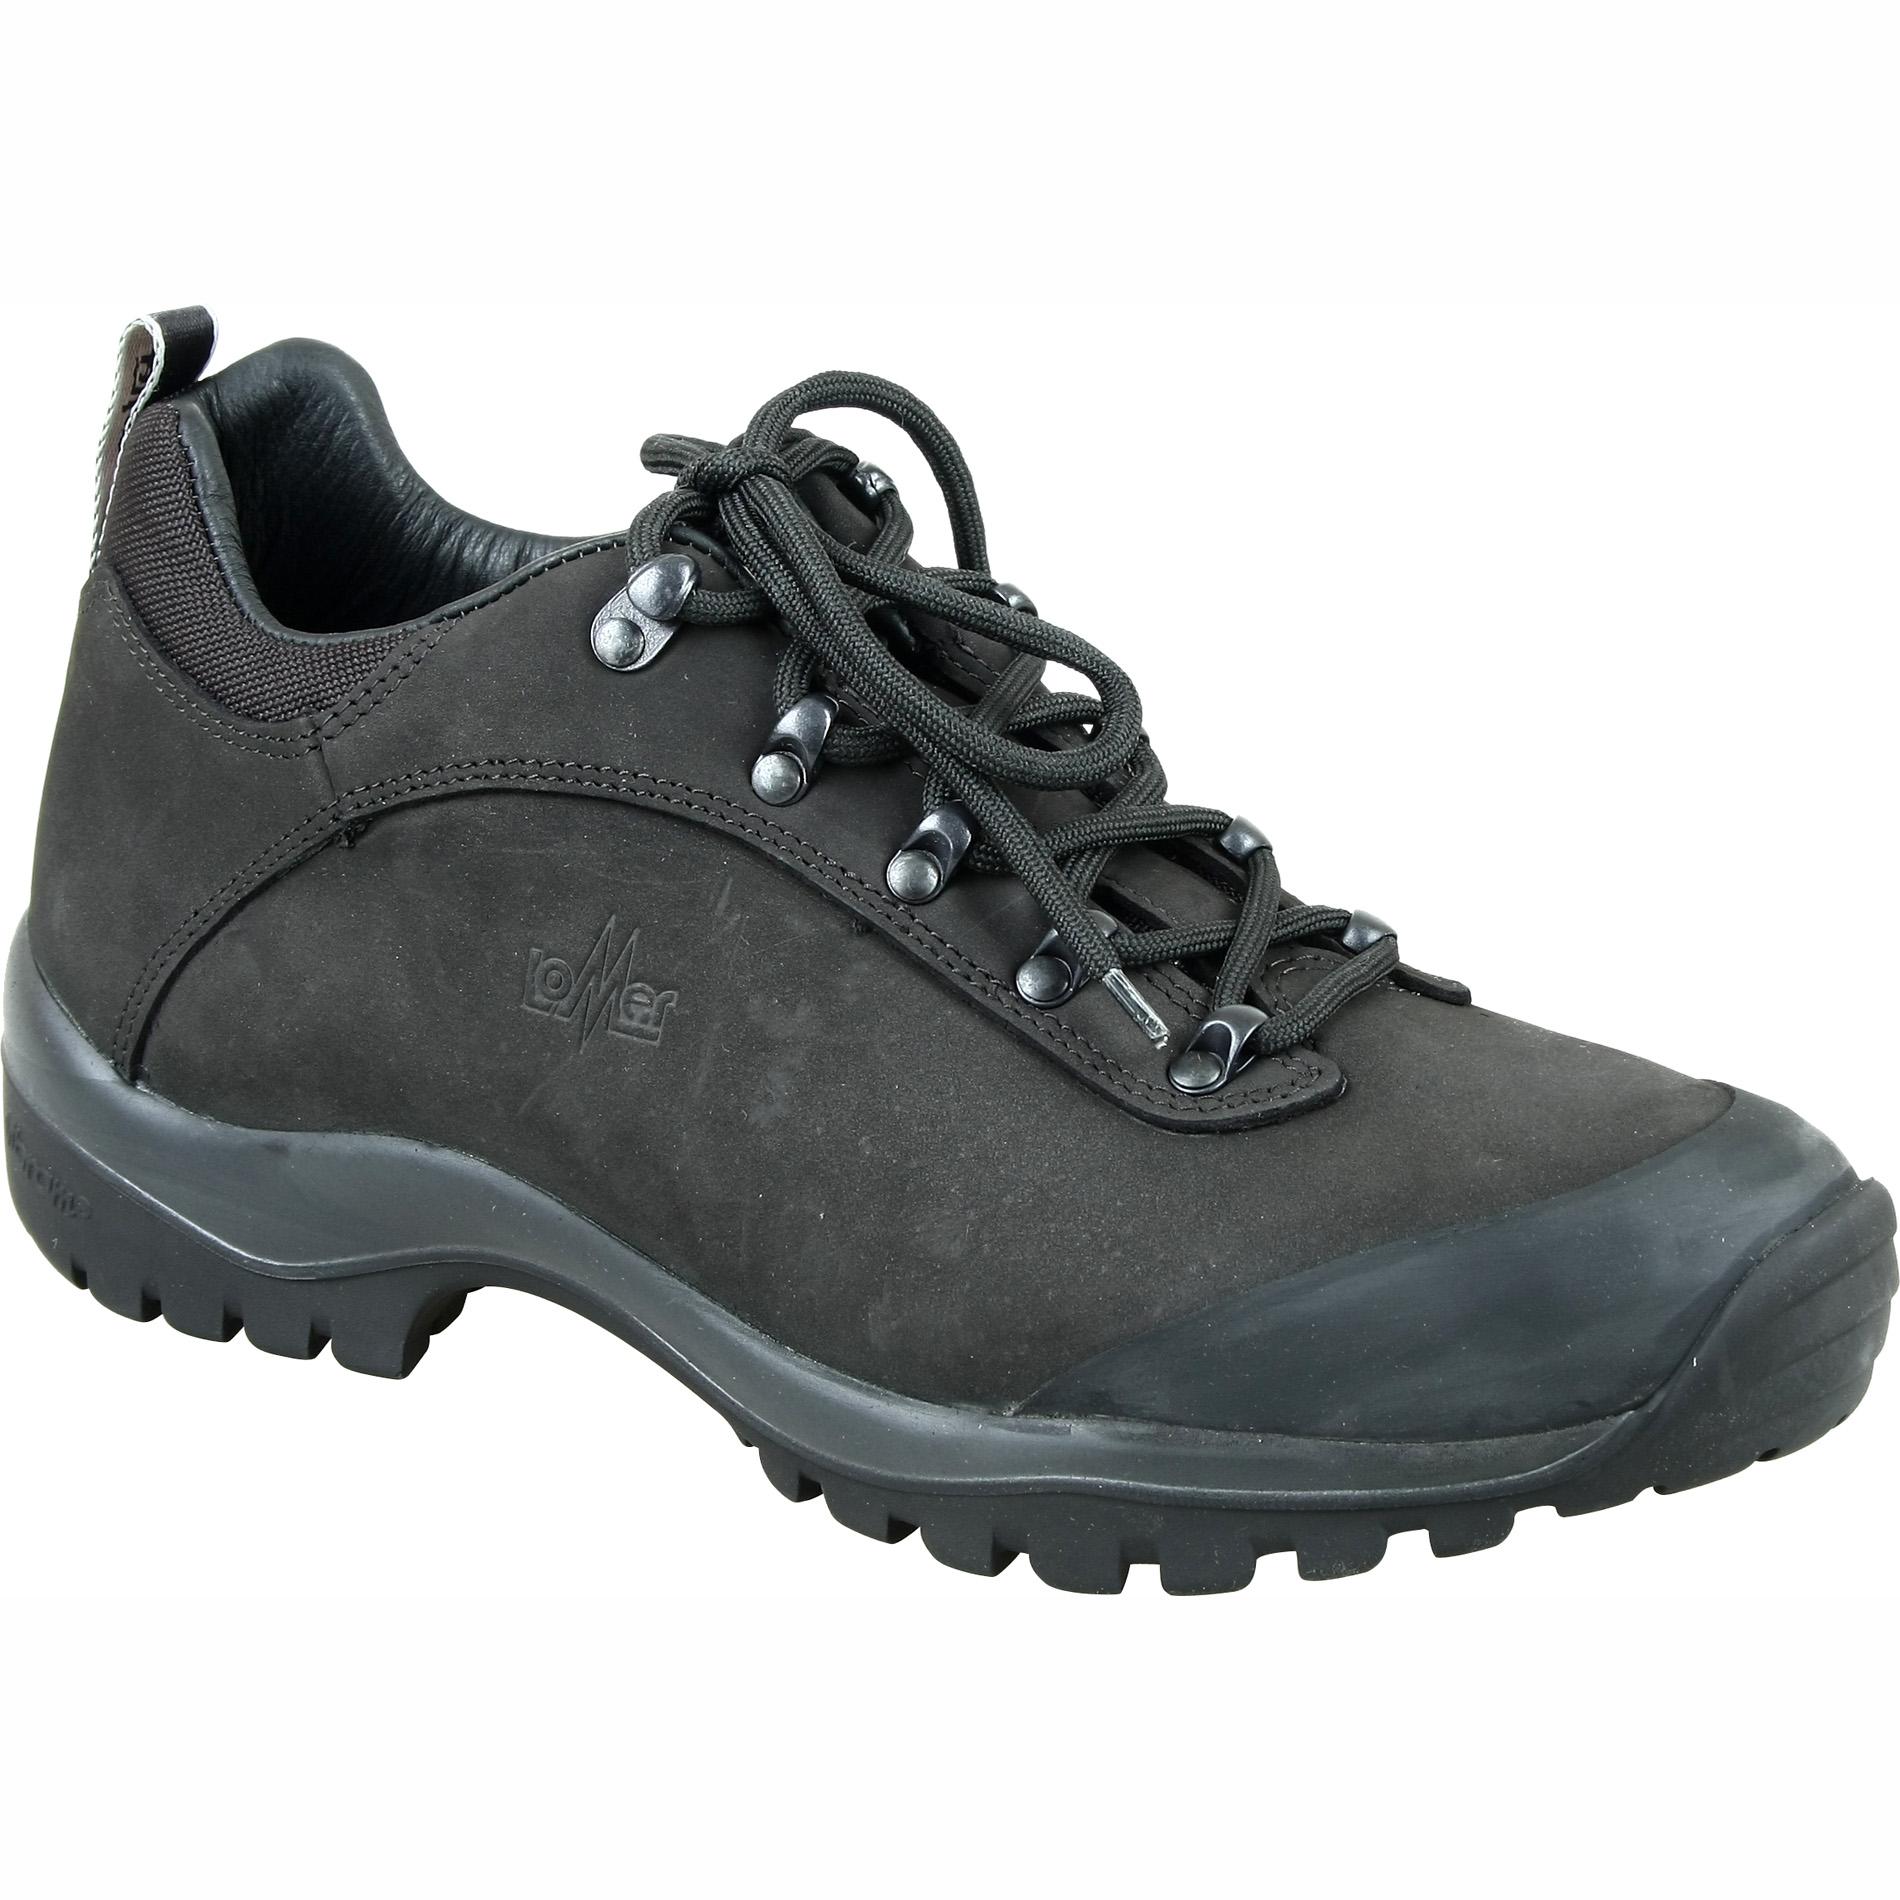 Ботинки трекинговые Lomer Terrain antra/gray